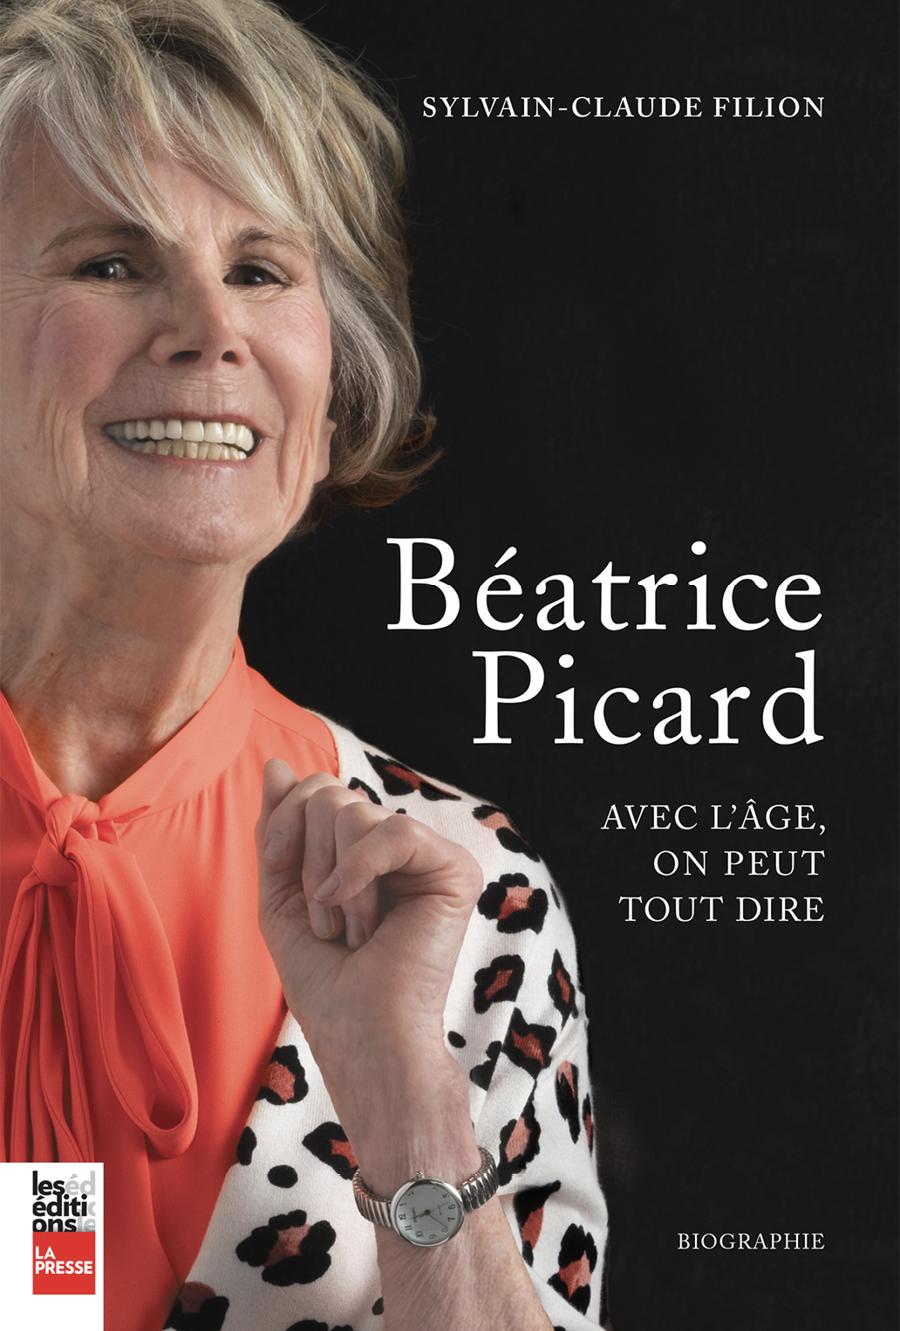 Béatrice Picard